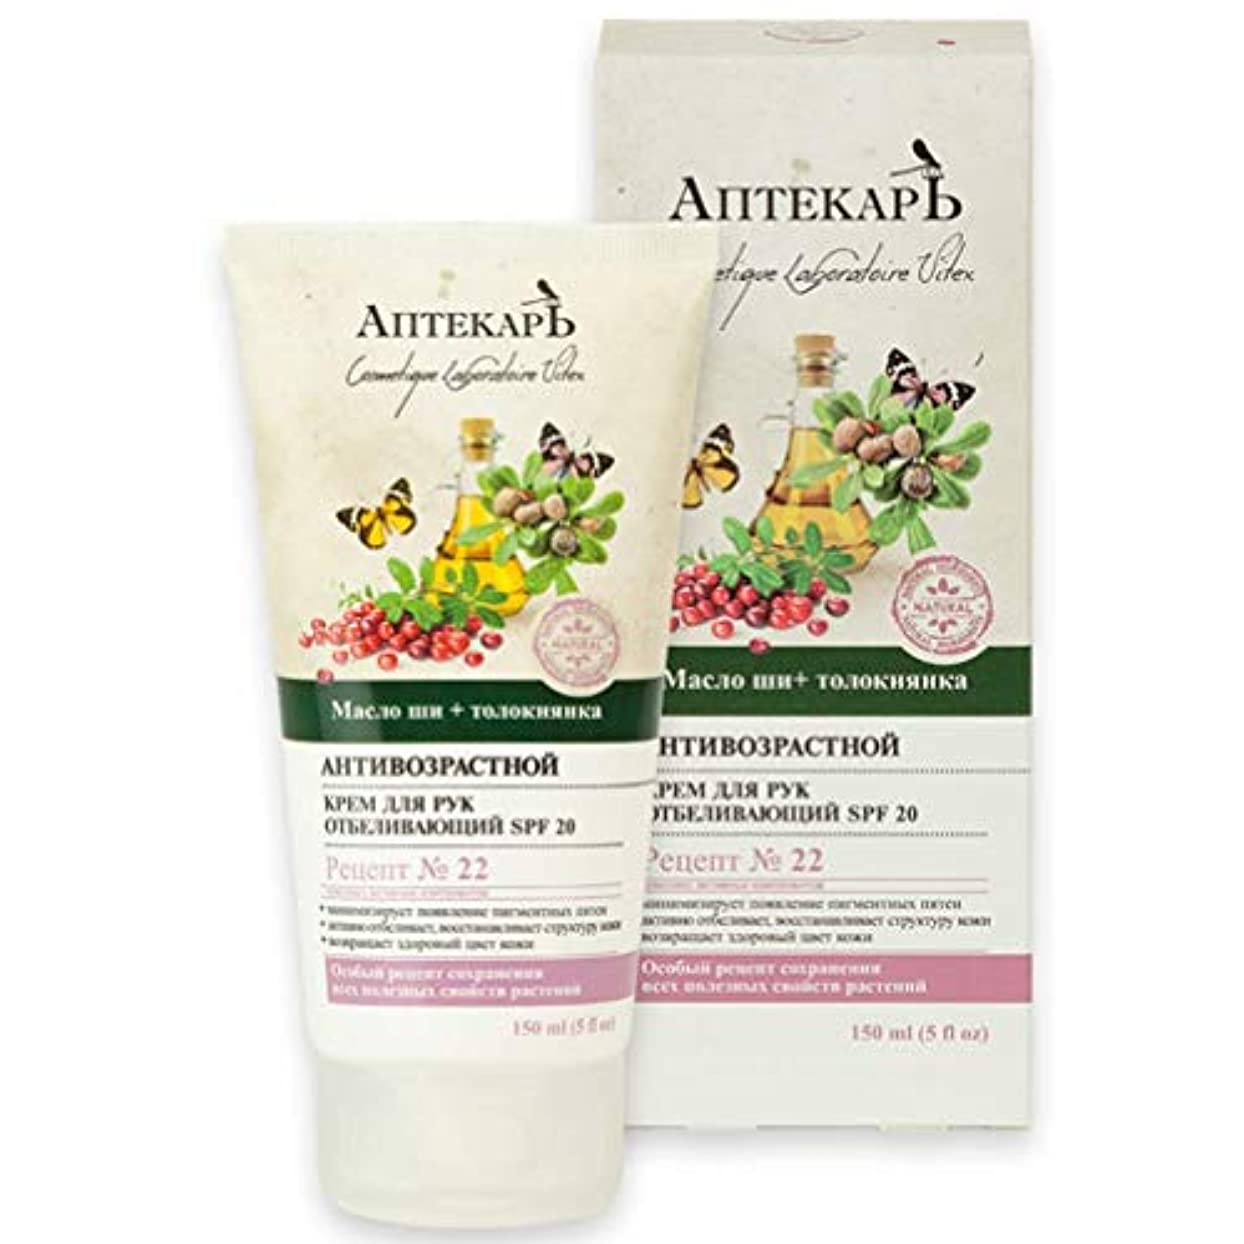 先入観仮称火山のBielita & Vitex | Chemist Line | Whitening Hand Cream | SPF 20 | Arctostaphylos Uva-ursi | Butyrospermum Parkii...